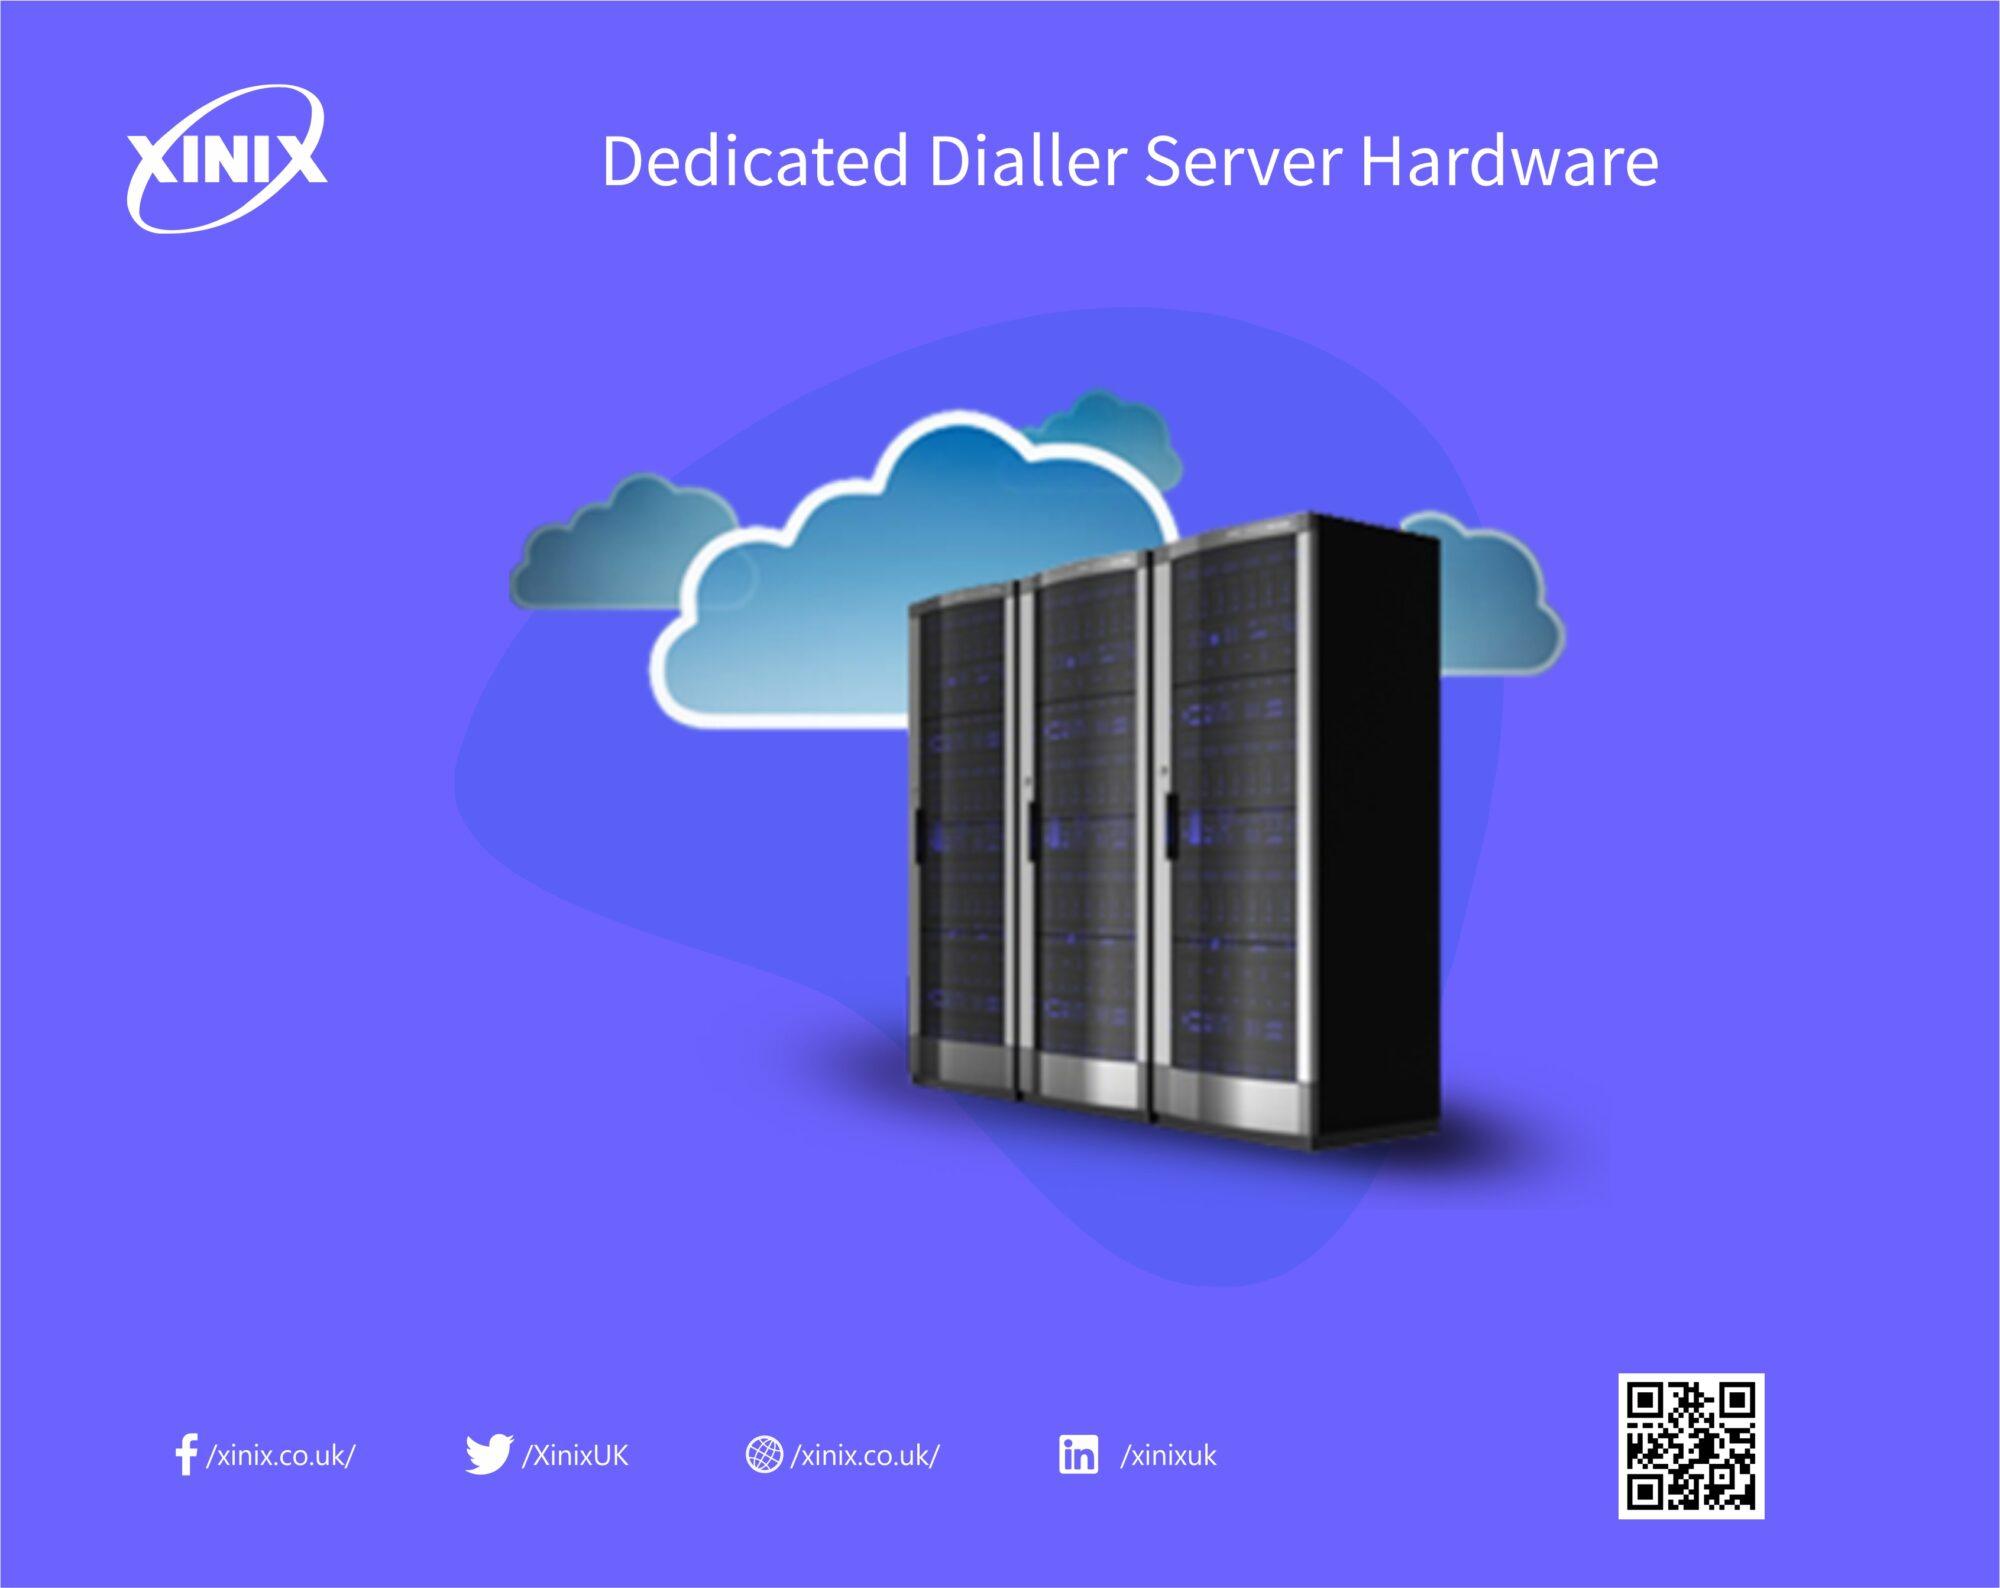 Dedicated Dialler Server Hardware